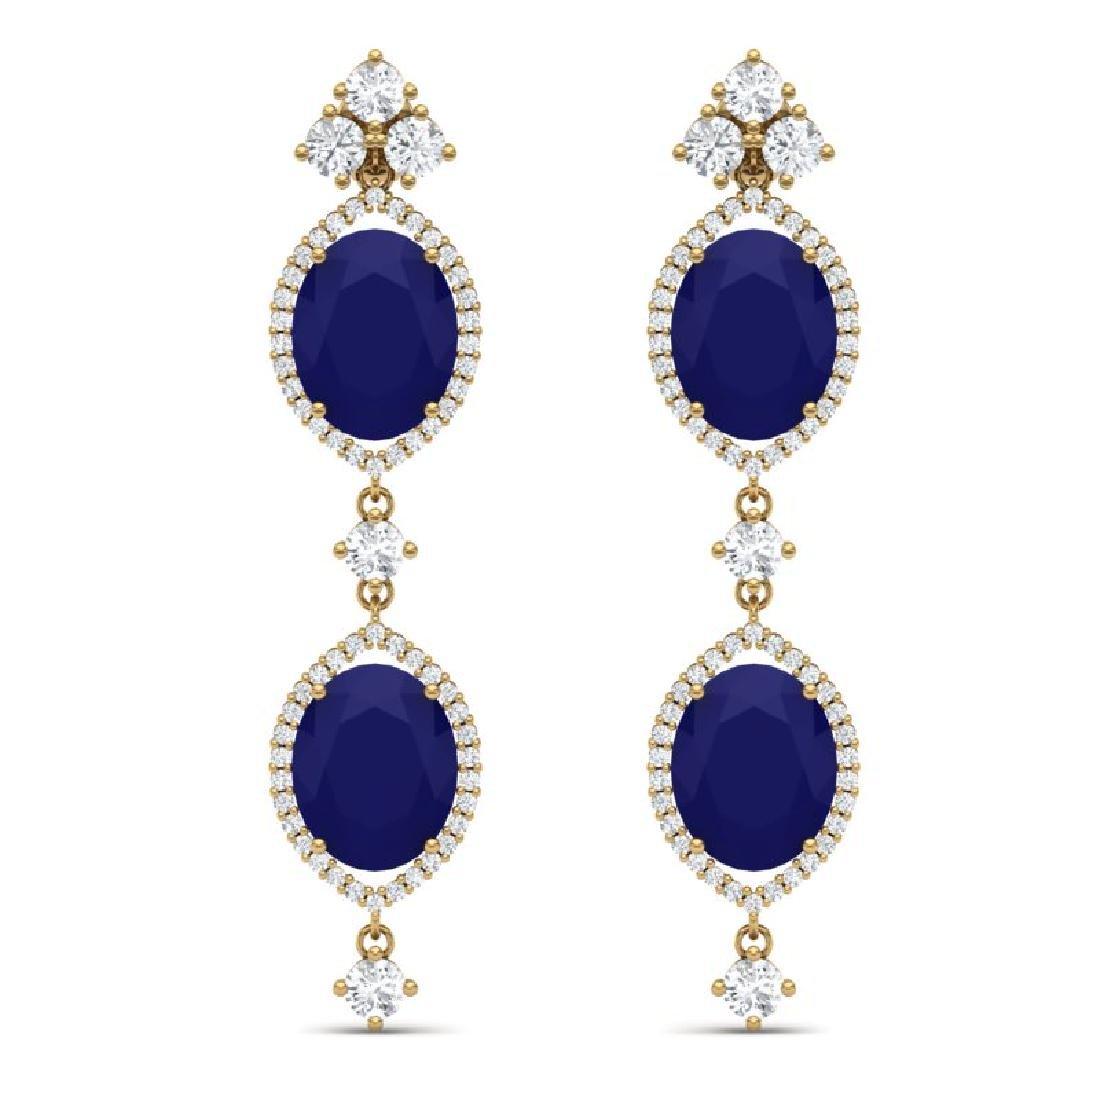 15.81 CTW Royalty Sapphire & VS Diamond Earrings 18K